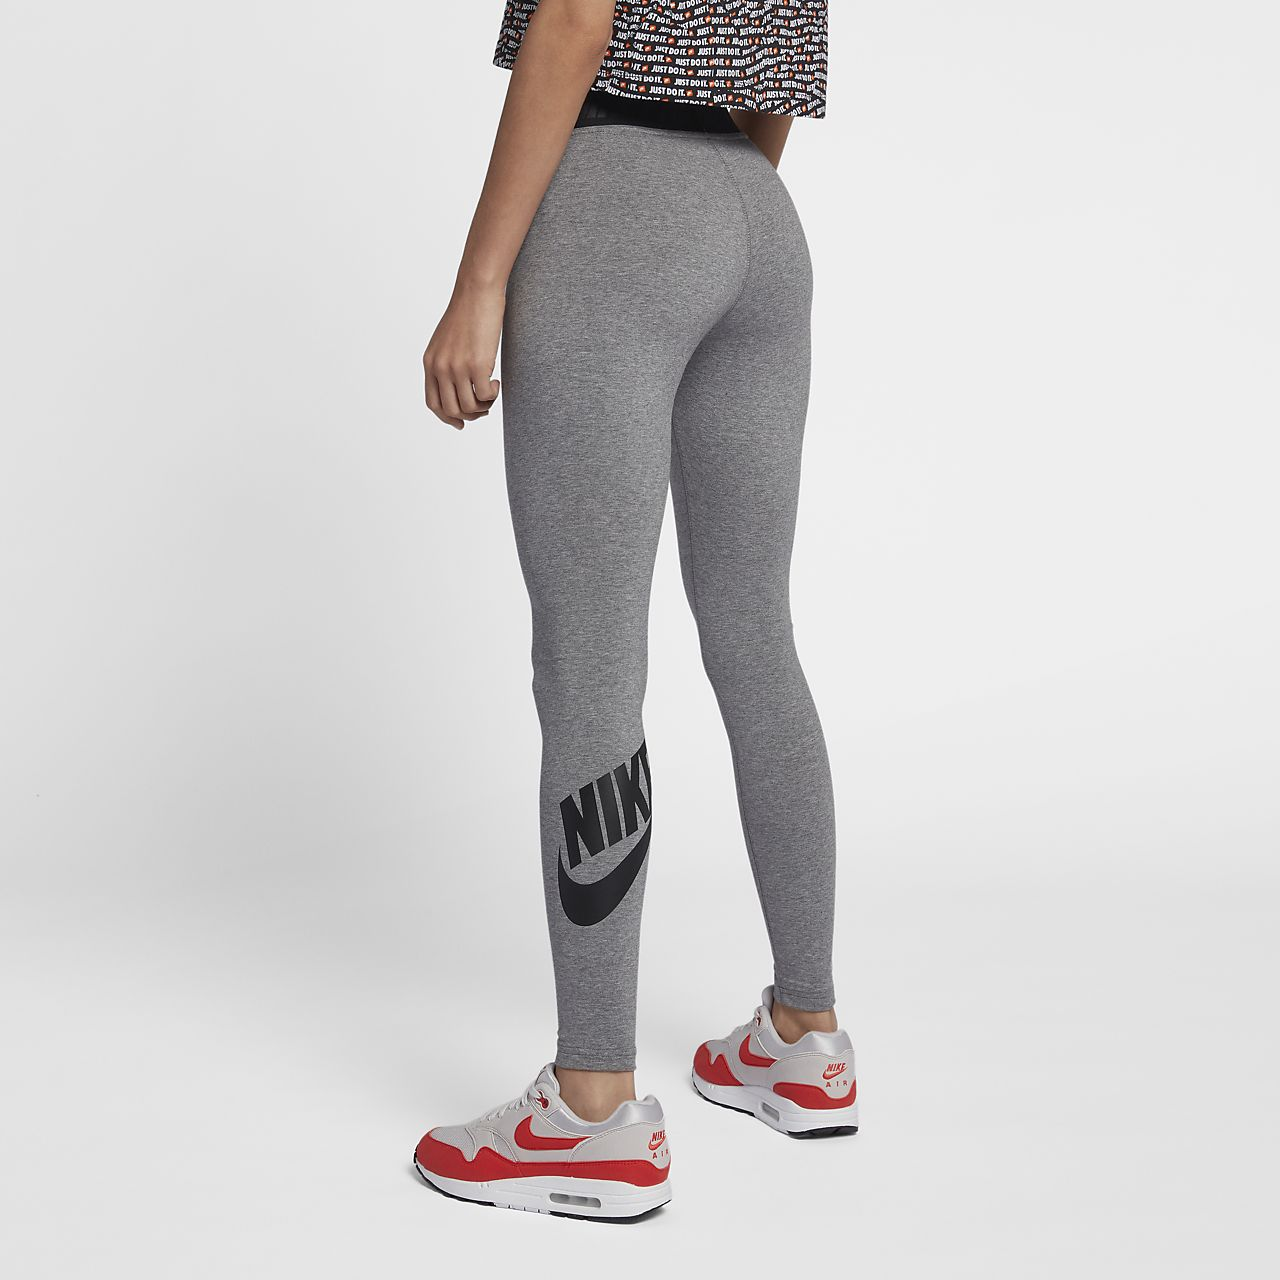 78fbd3cbdd Leggings a vita alta Nike Sportswear Leg-A-See - Donna. Nike.com CH